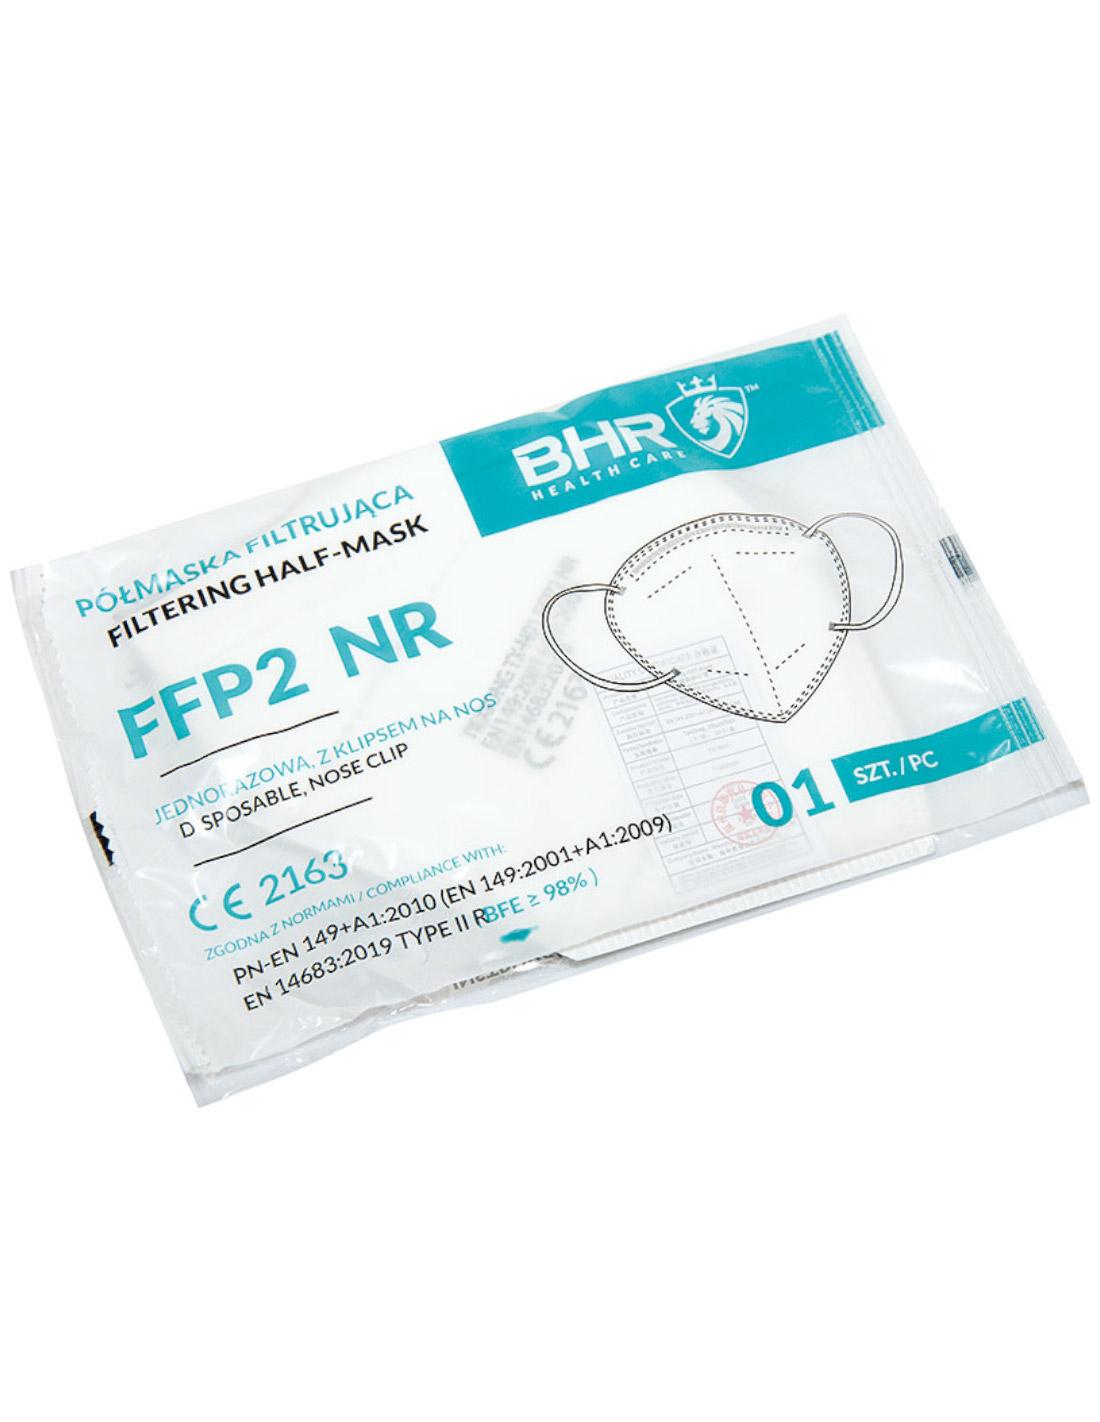 PÓŁMASKA FILTRUJĄCA FFP2 TX-N01